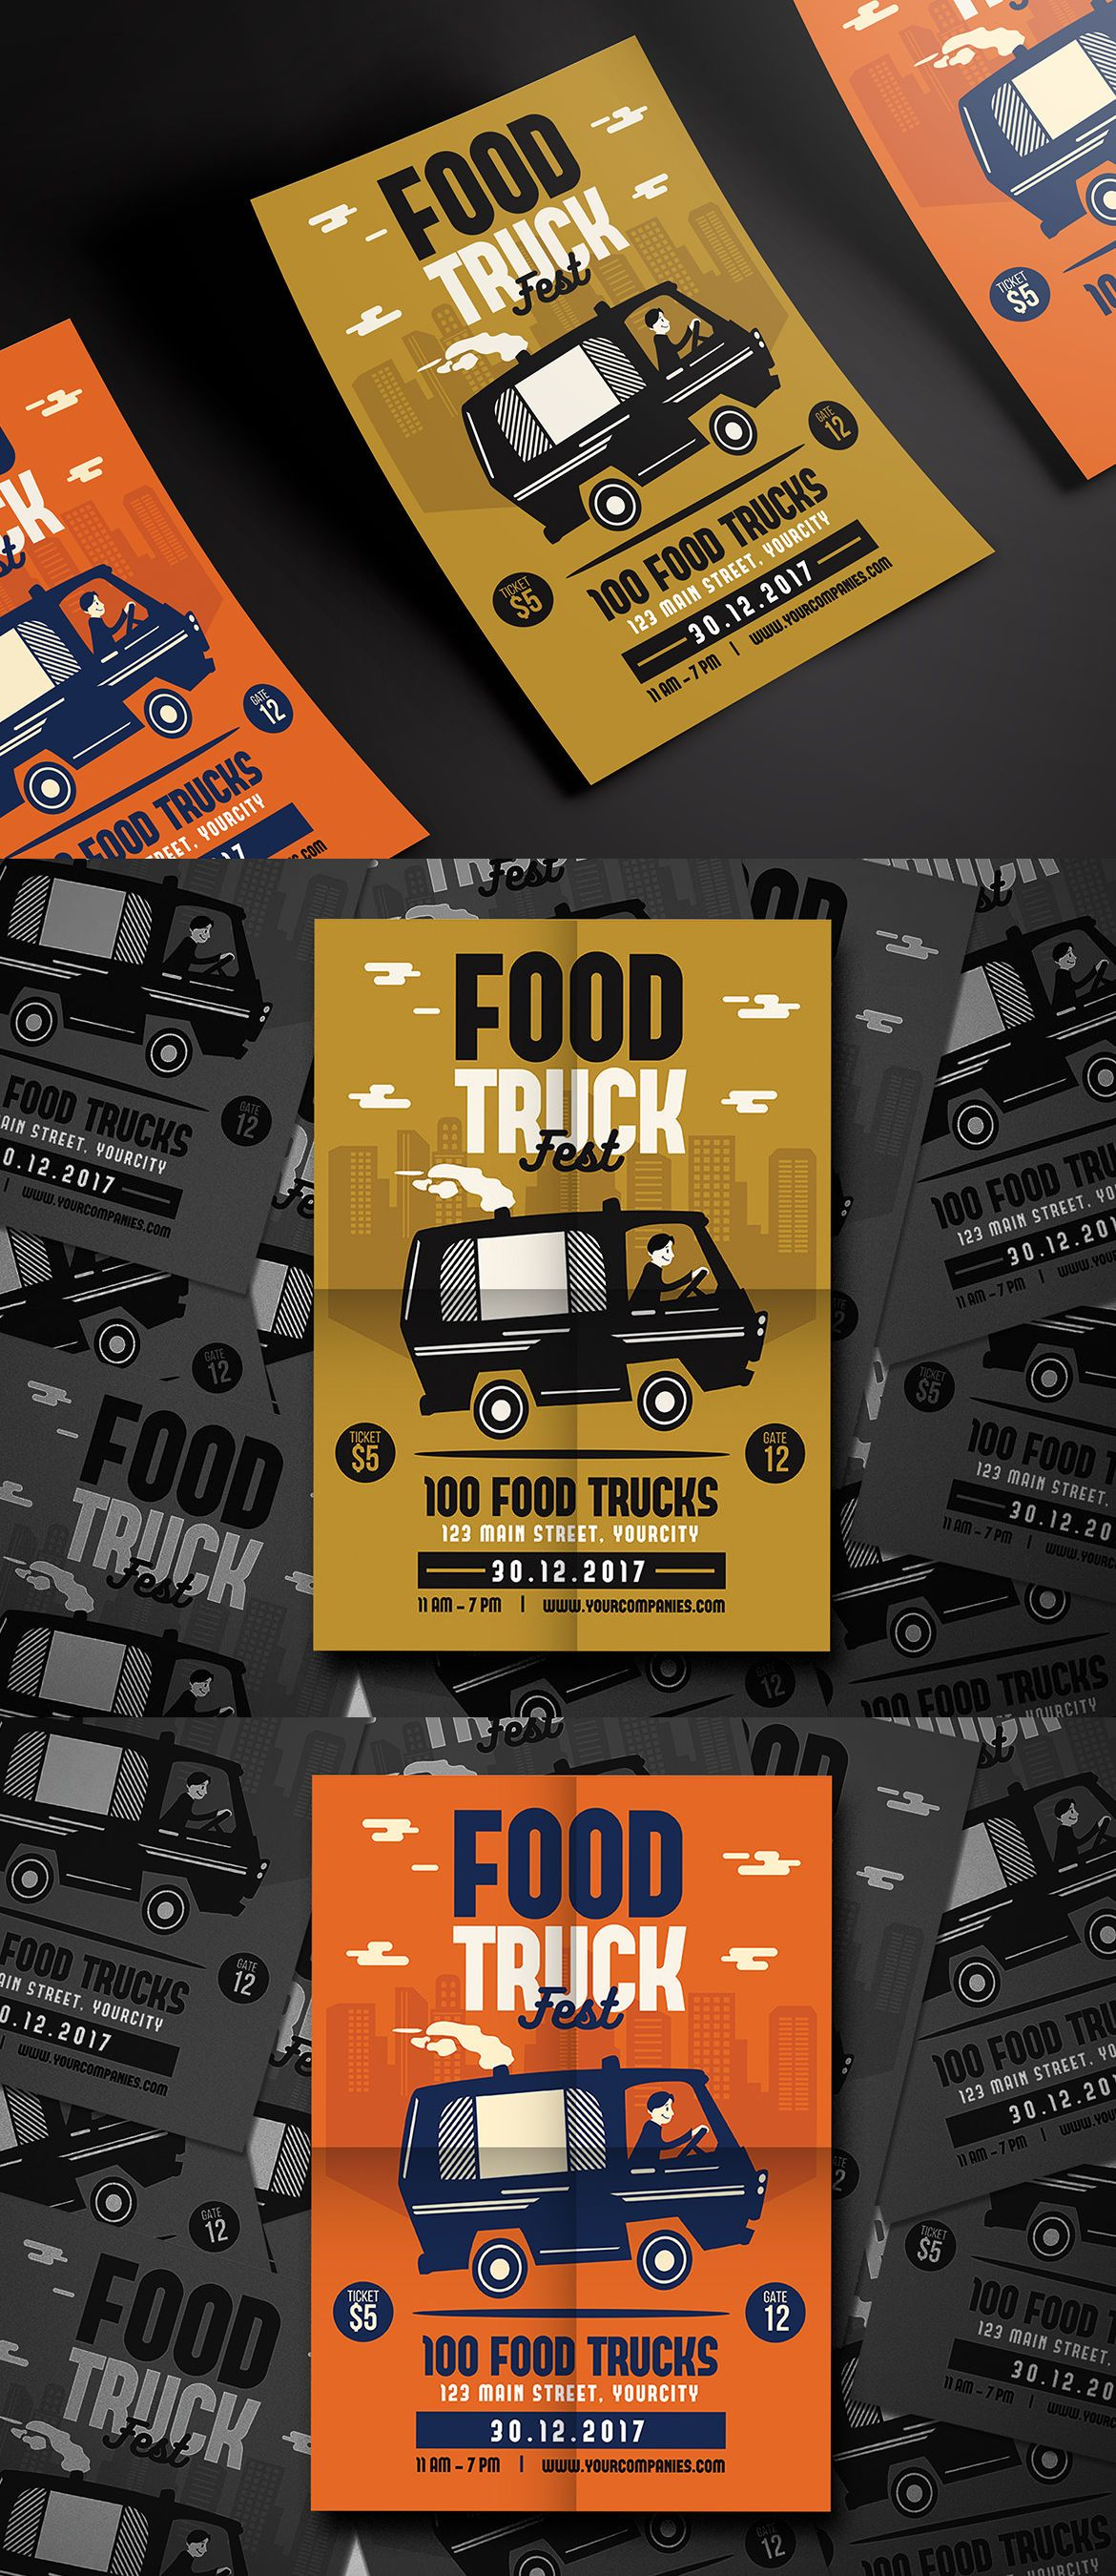 Food Truck Fest Flyer Template AI PSD Poster Design Pinterest - Food truck flyer template